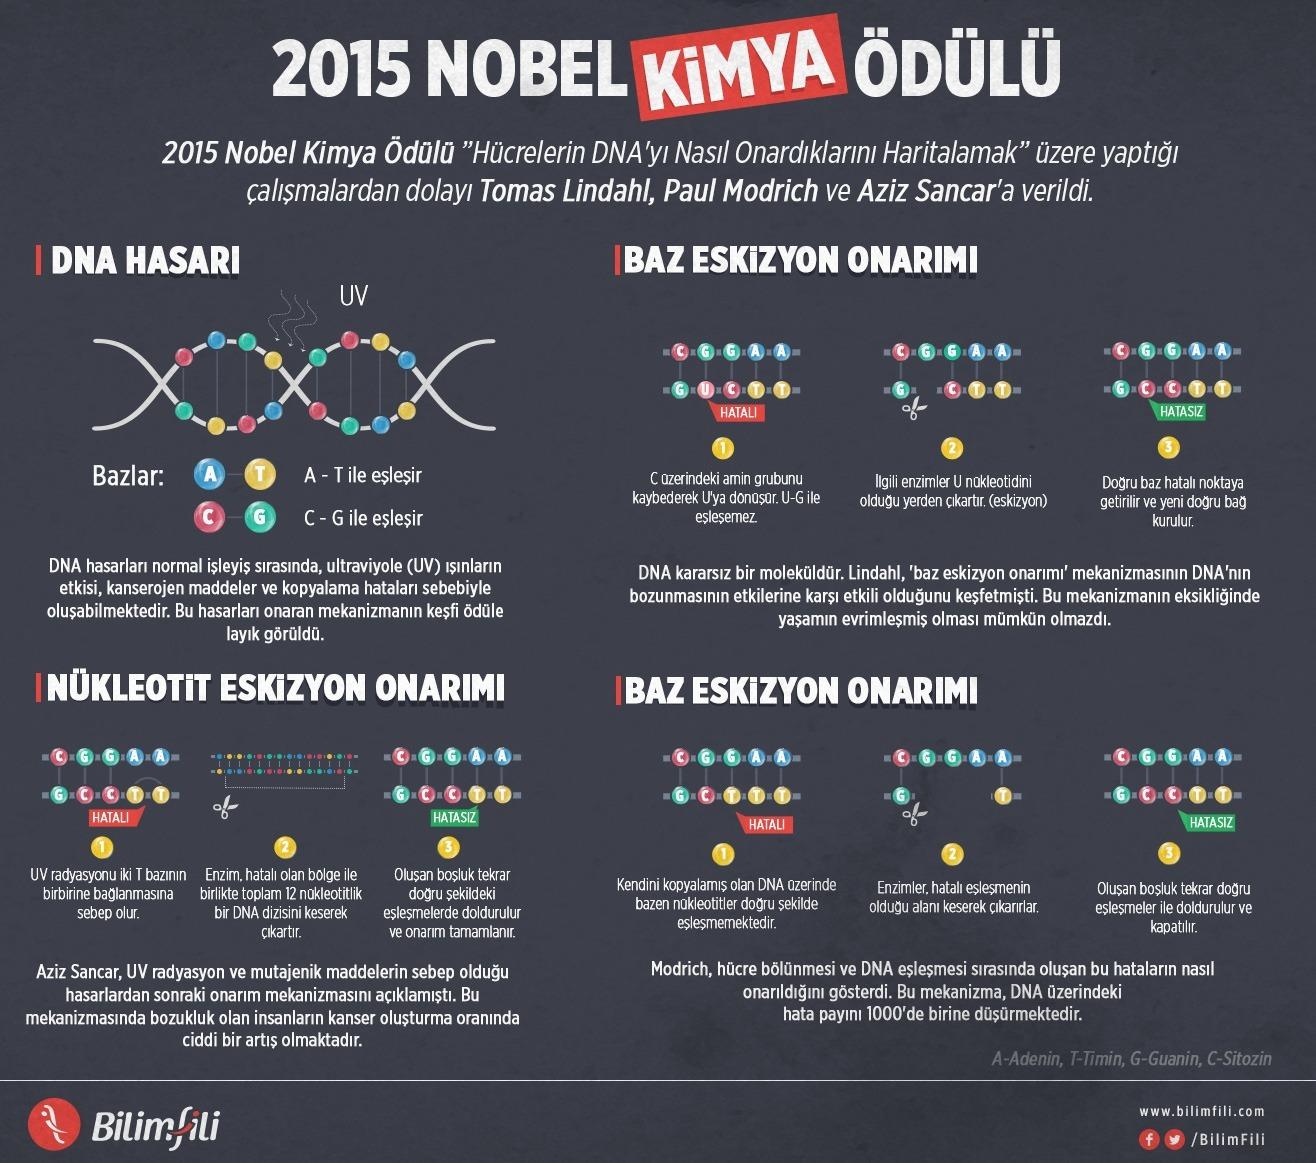 nobel-kimya-odulu-aziz-sancar1-bilimfilicom